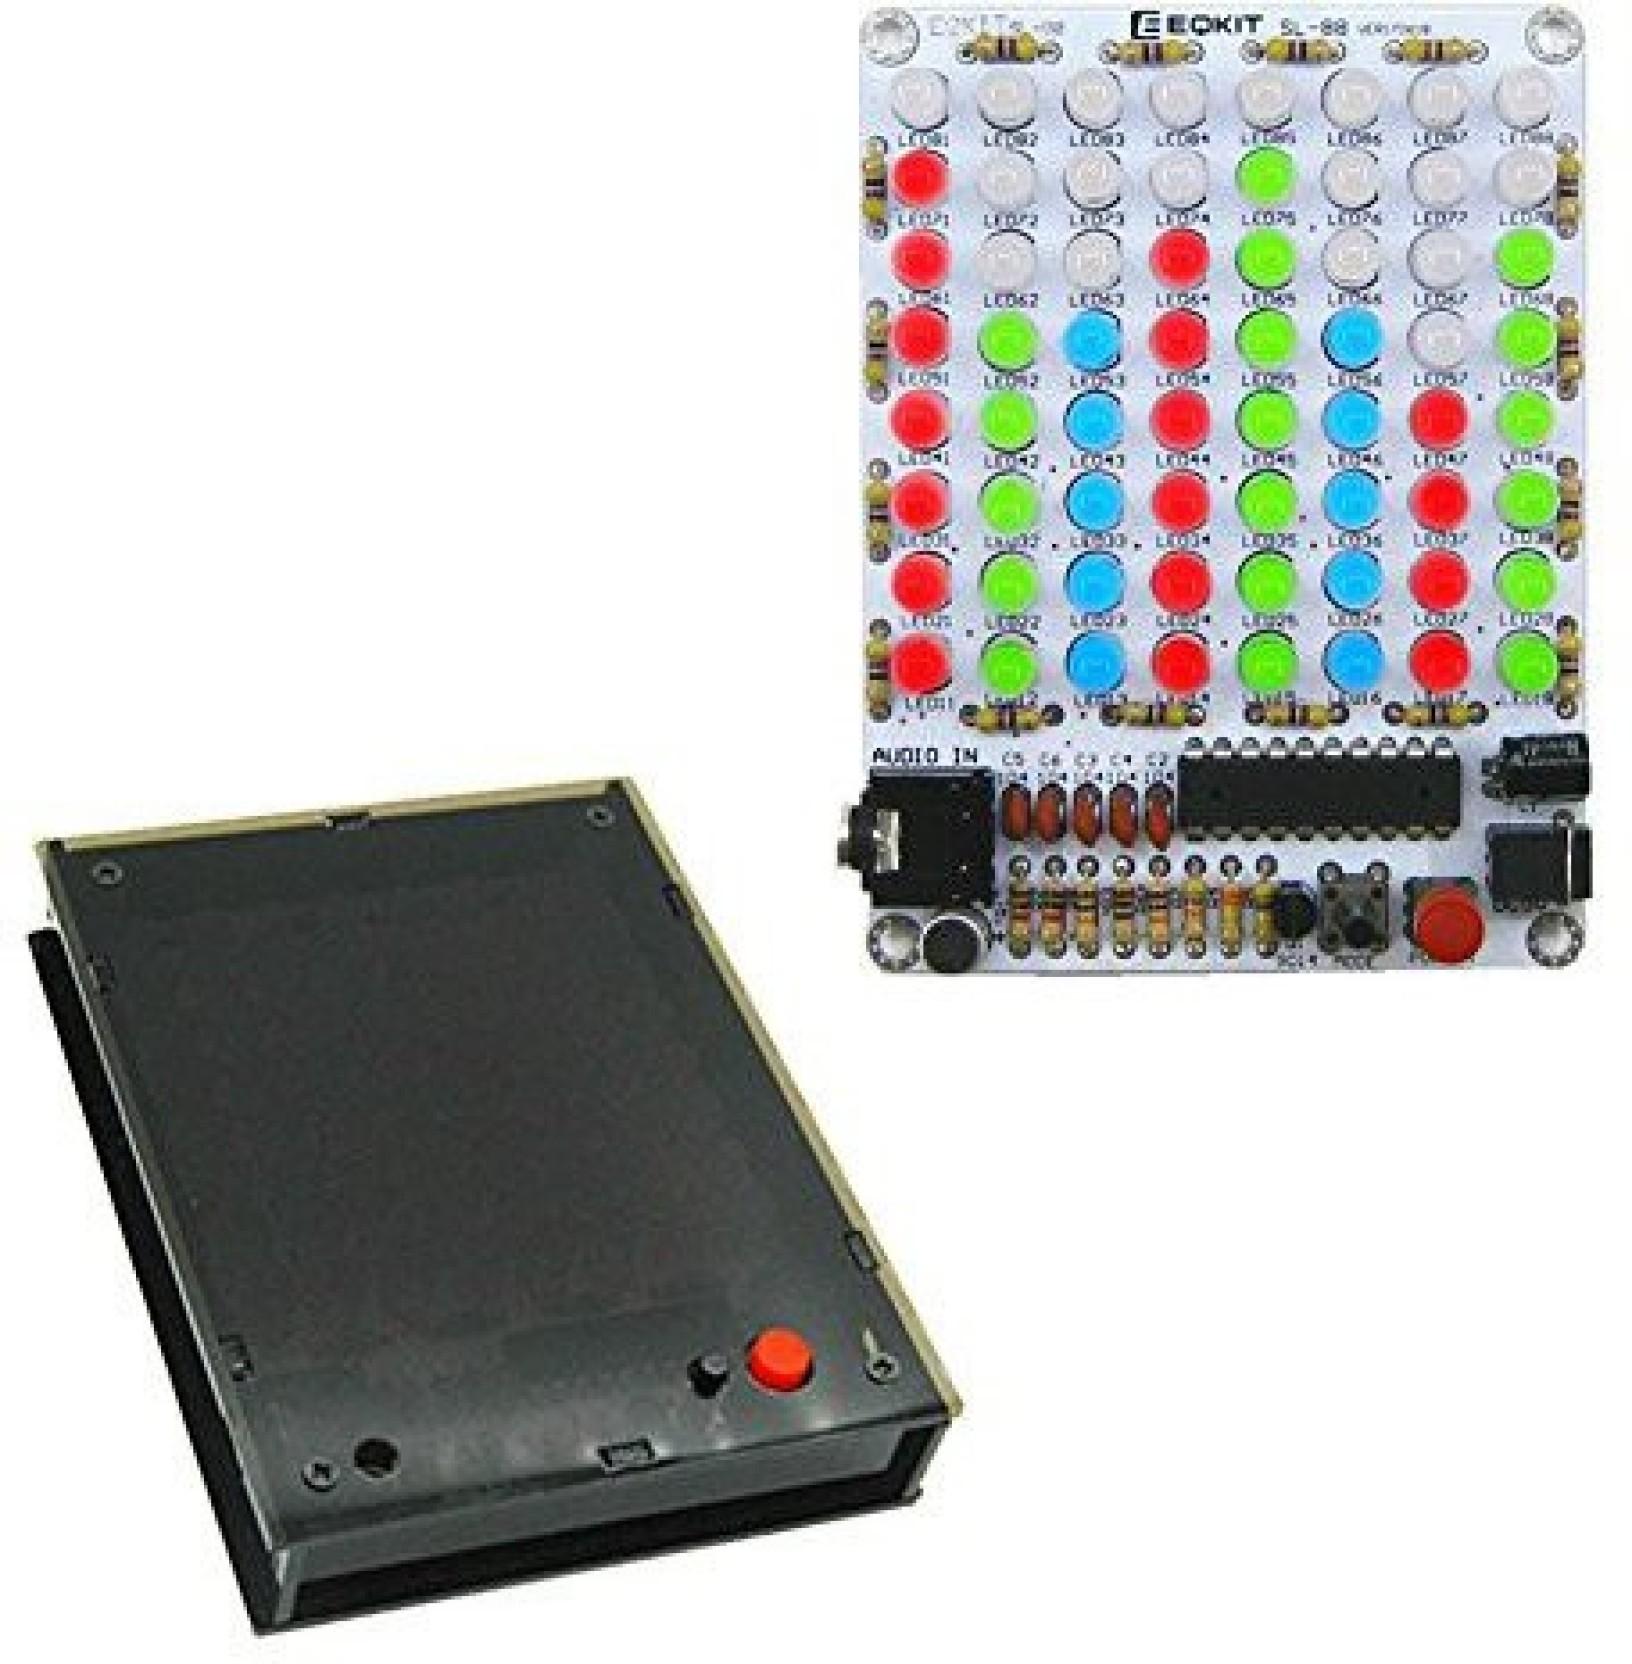 Generic Icstation 8x8 Color Led Sound Audio Spectrum Analyzer Level Circuit Electronic Design On Offer